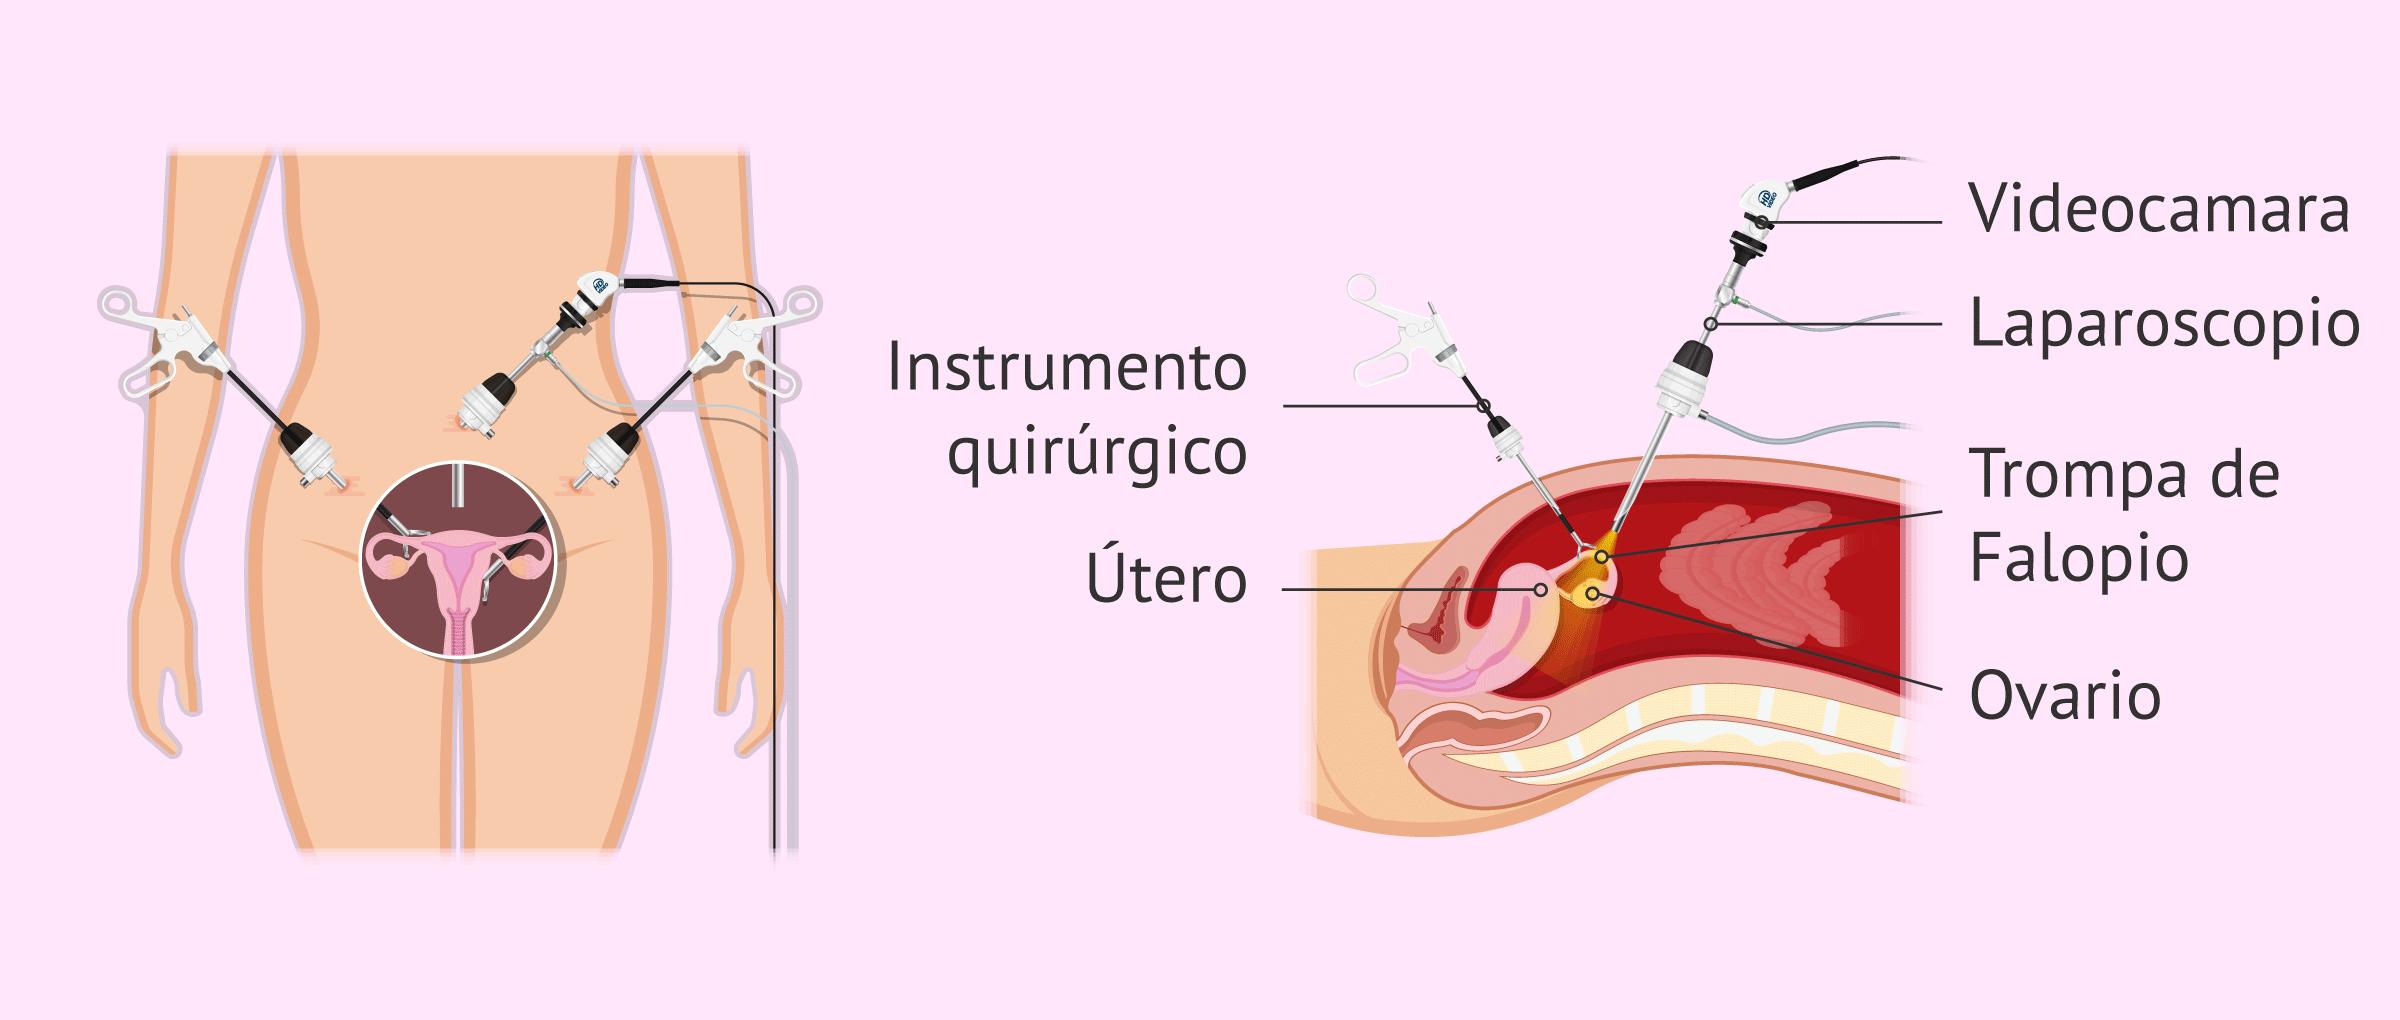 Vista frontal-lateral de una laparoscopia